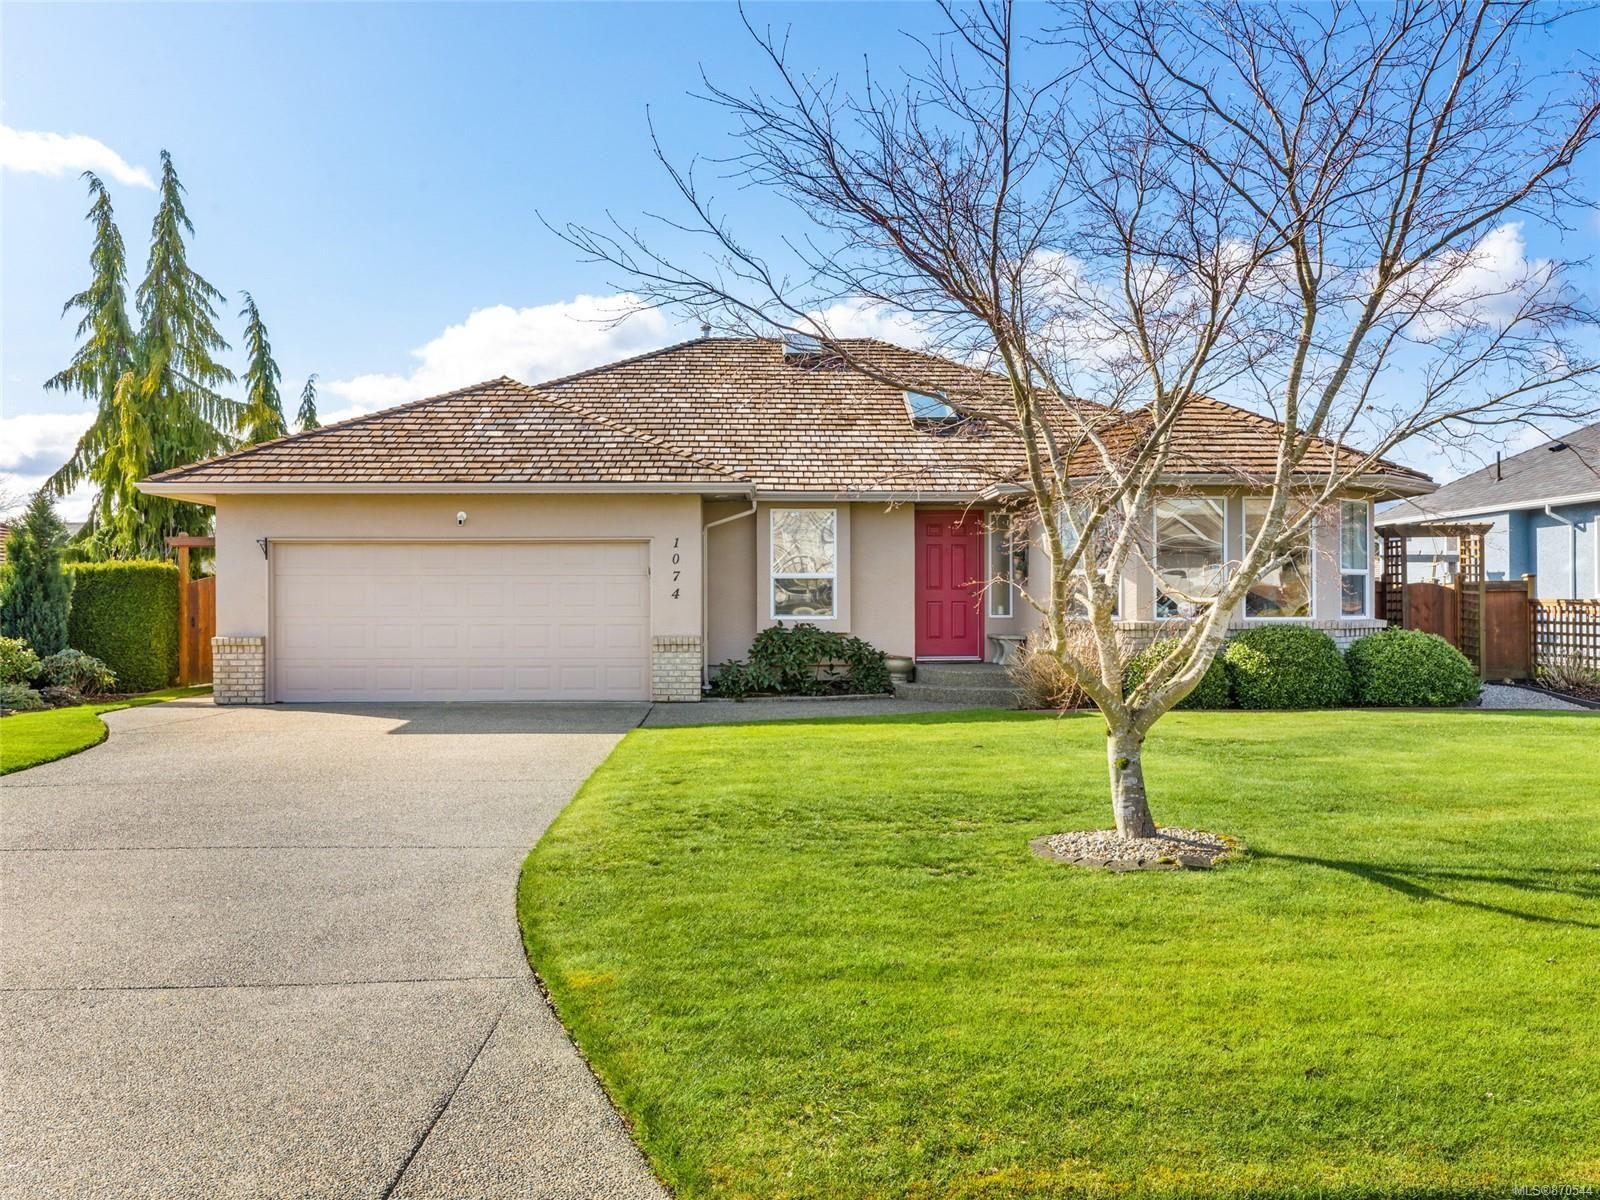 Main Photo: 1074 Sunrise Dr in : PQ Qualicum Beach House for sale (Parksville/Qualicum)  : MLS®# 870544